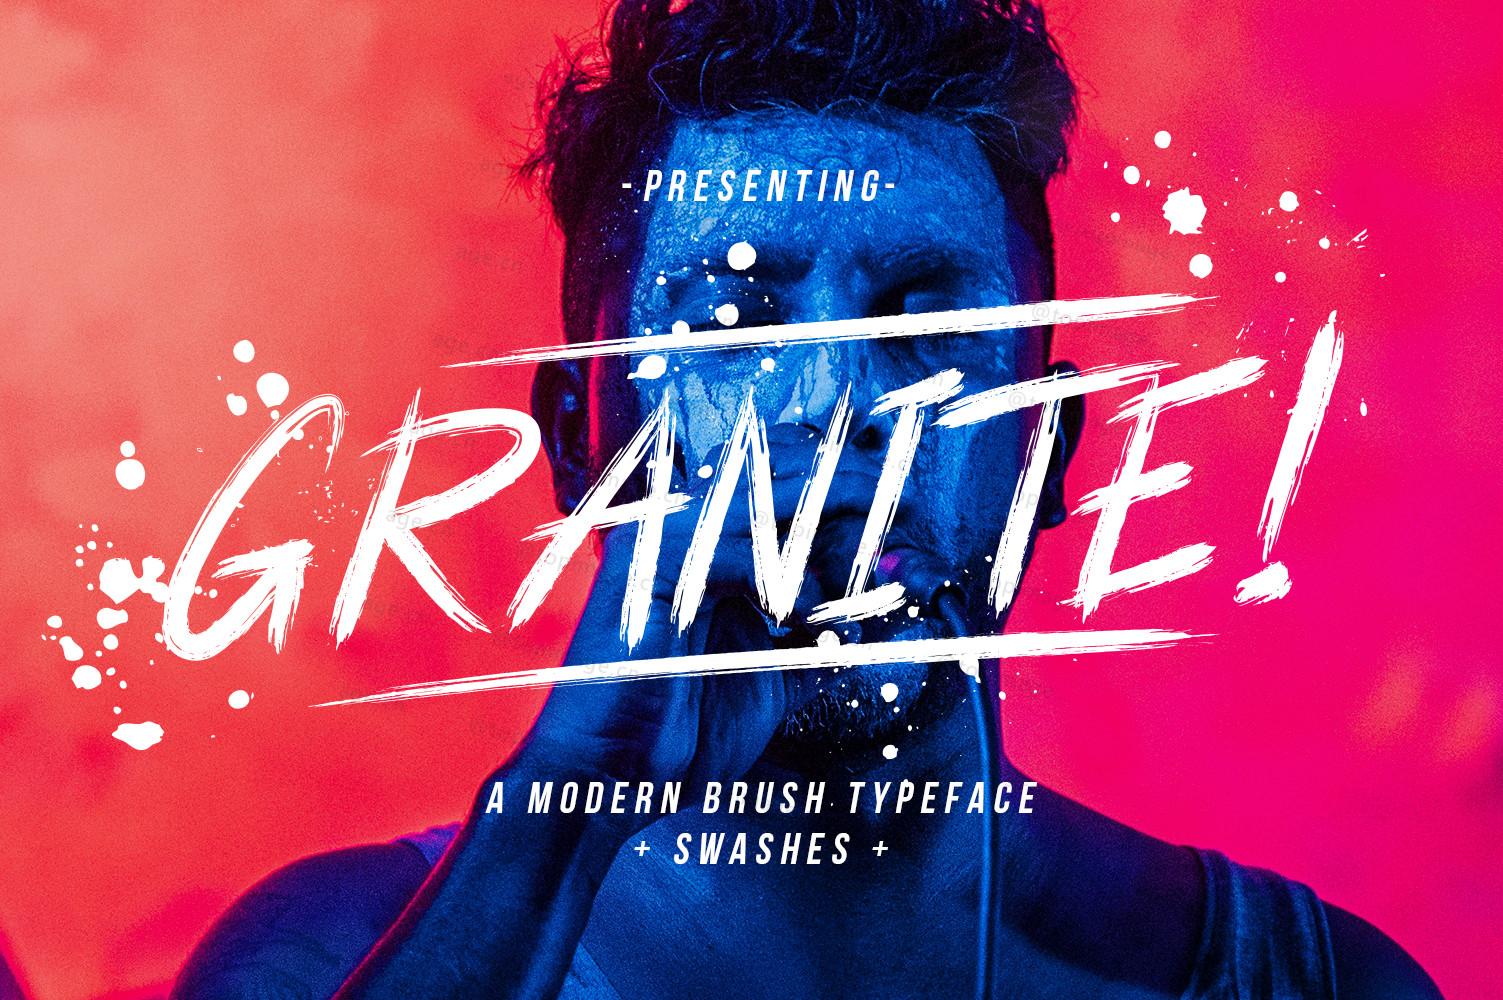 Granite手绘笔刷书法喷溅毛笔英文字体下载